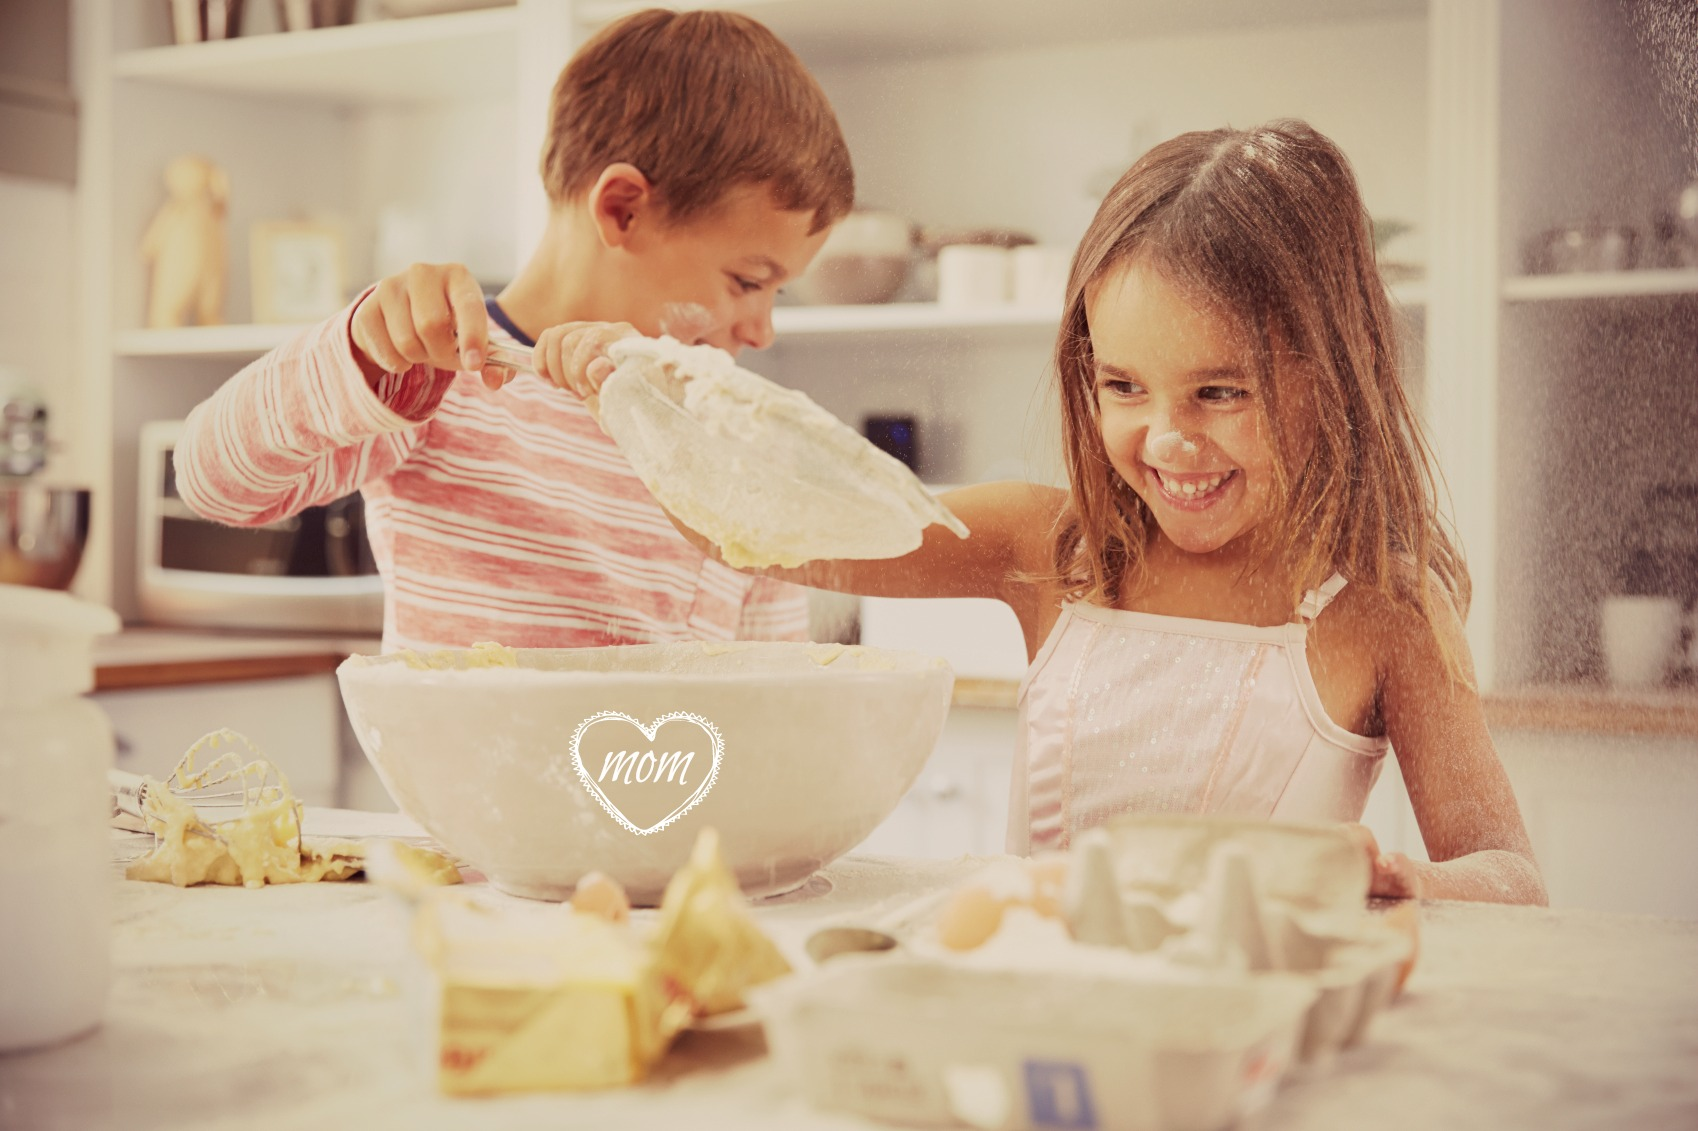 Tres recetas f ciles para cocinar con ni os univision - Musica para cocinar ...